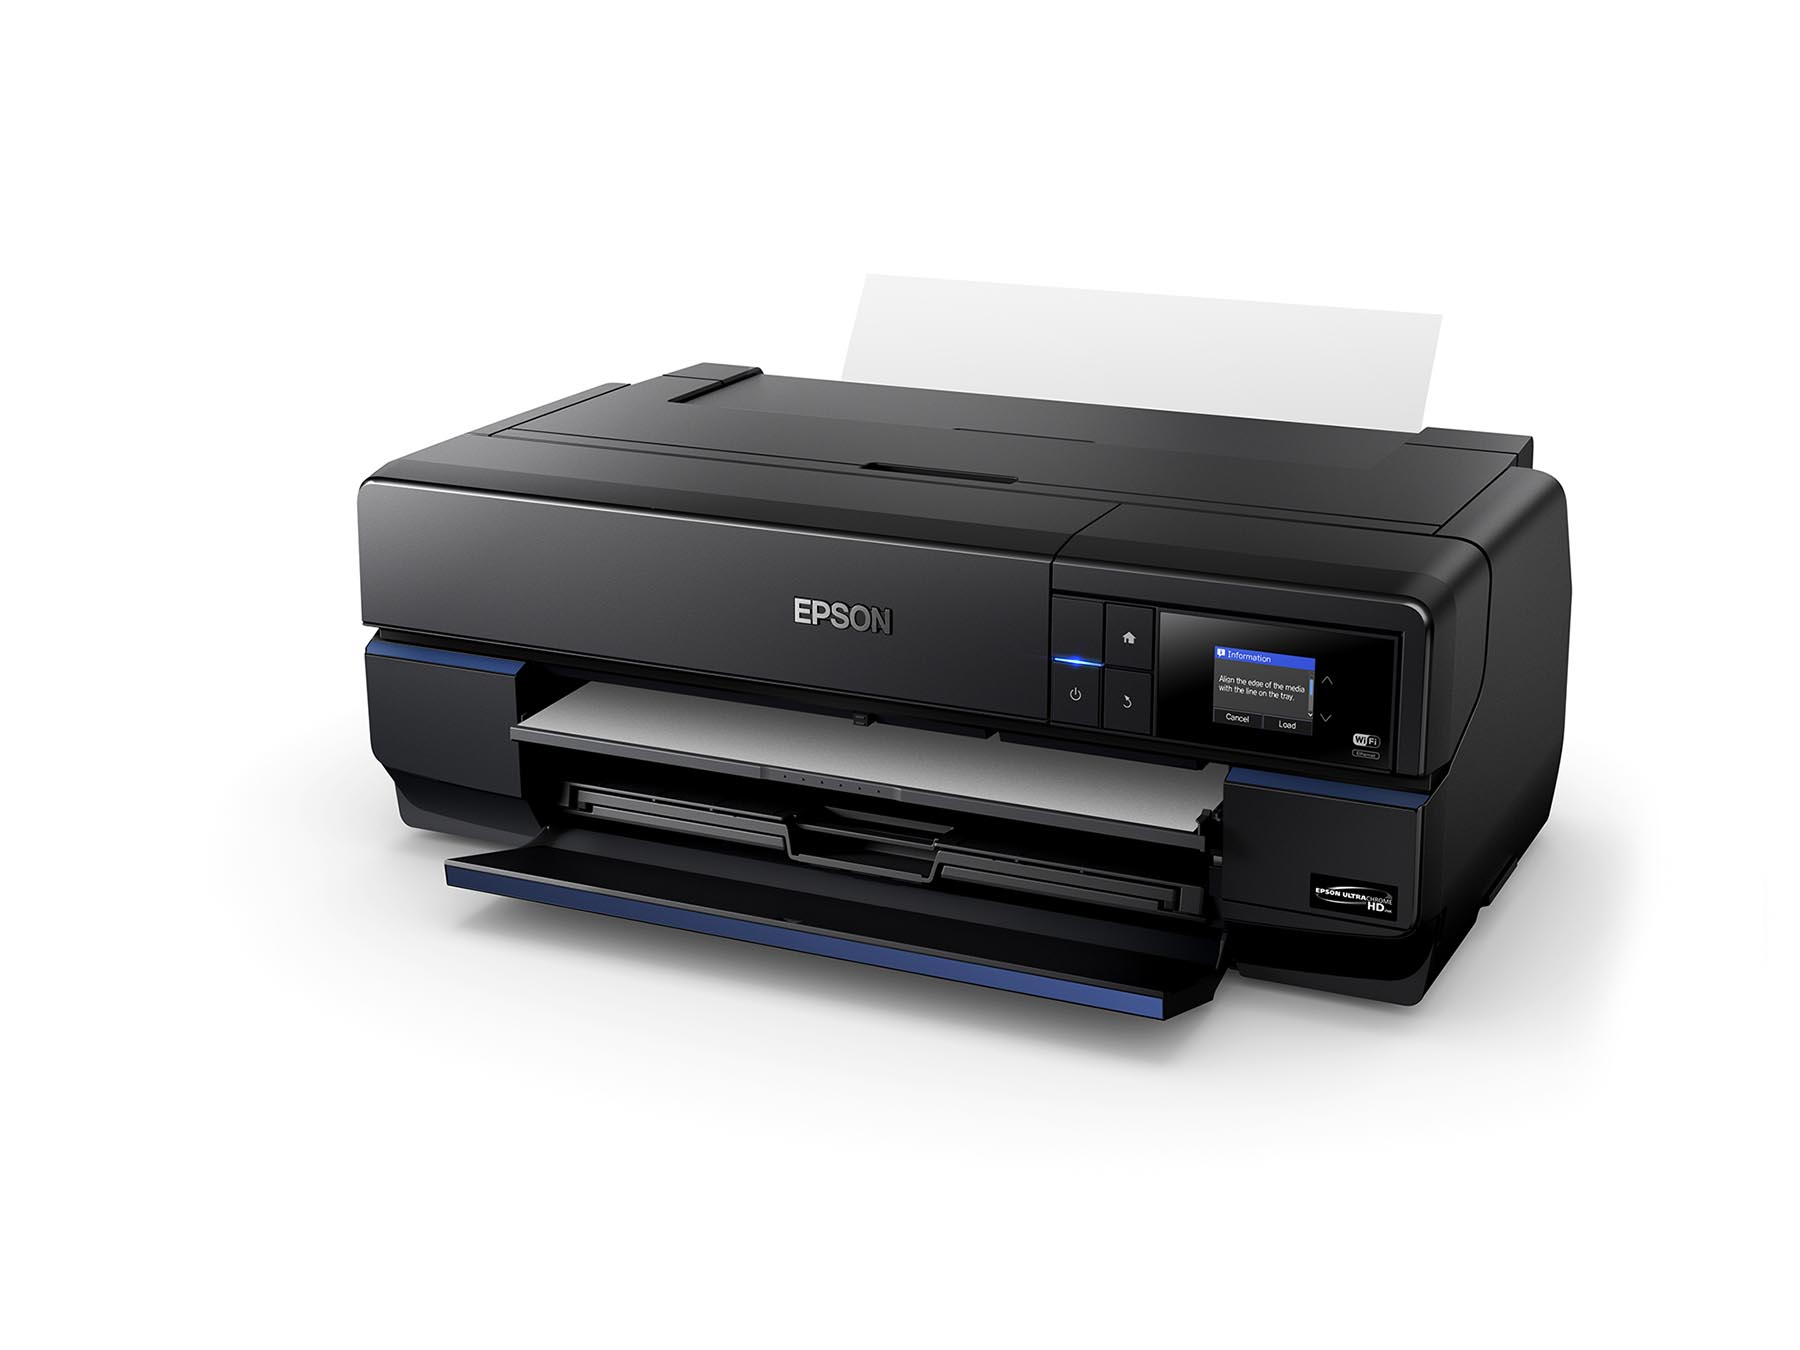 Epson SureColor P800 Design Edition Printer - Imaging Spectrum